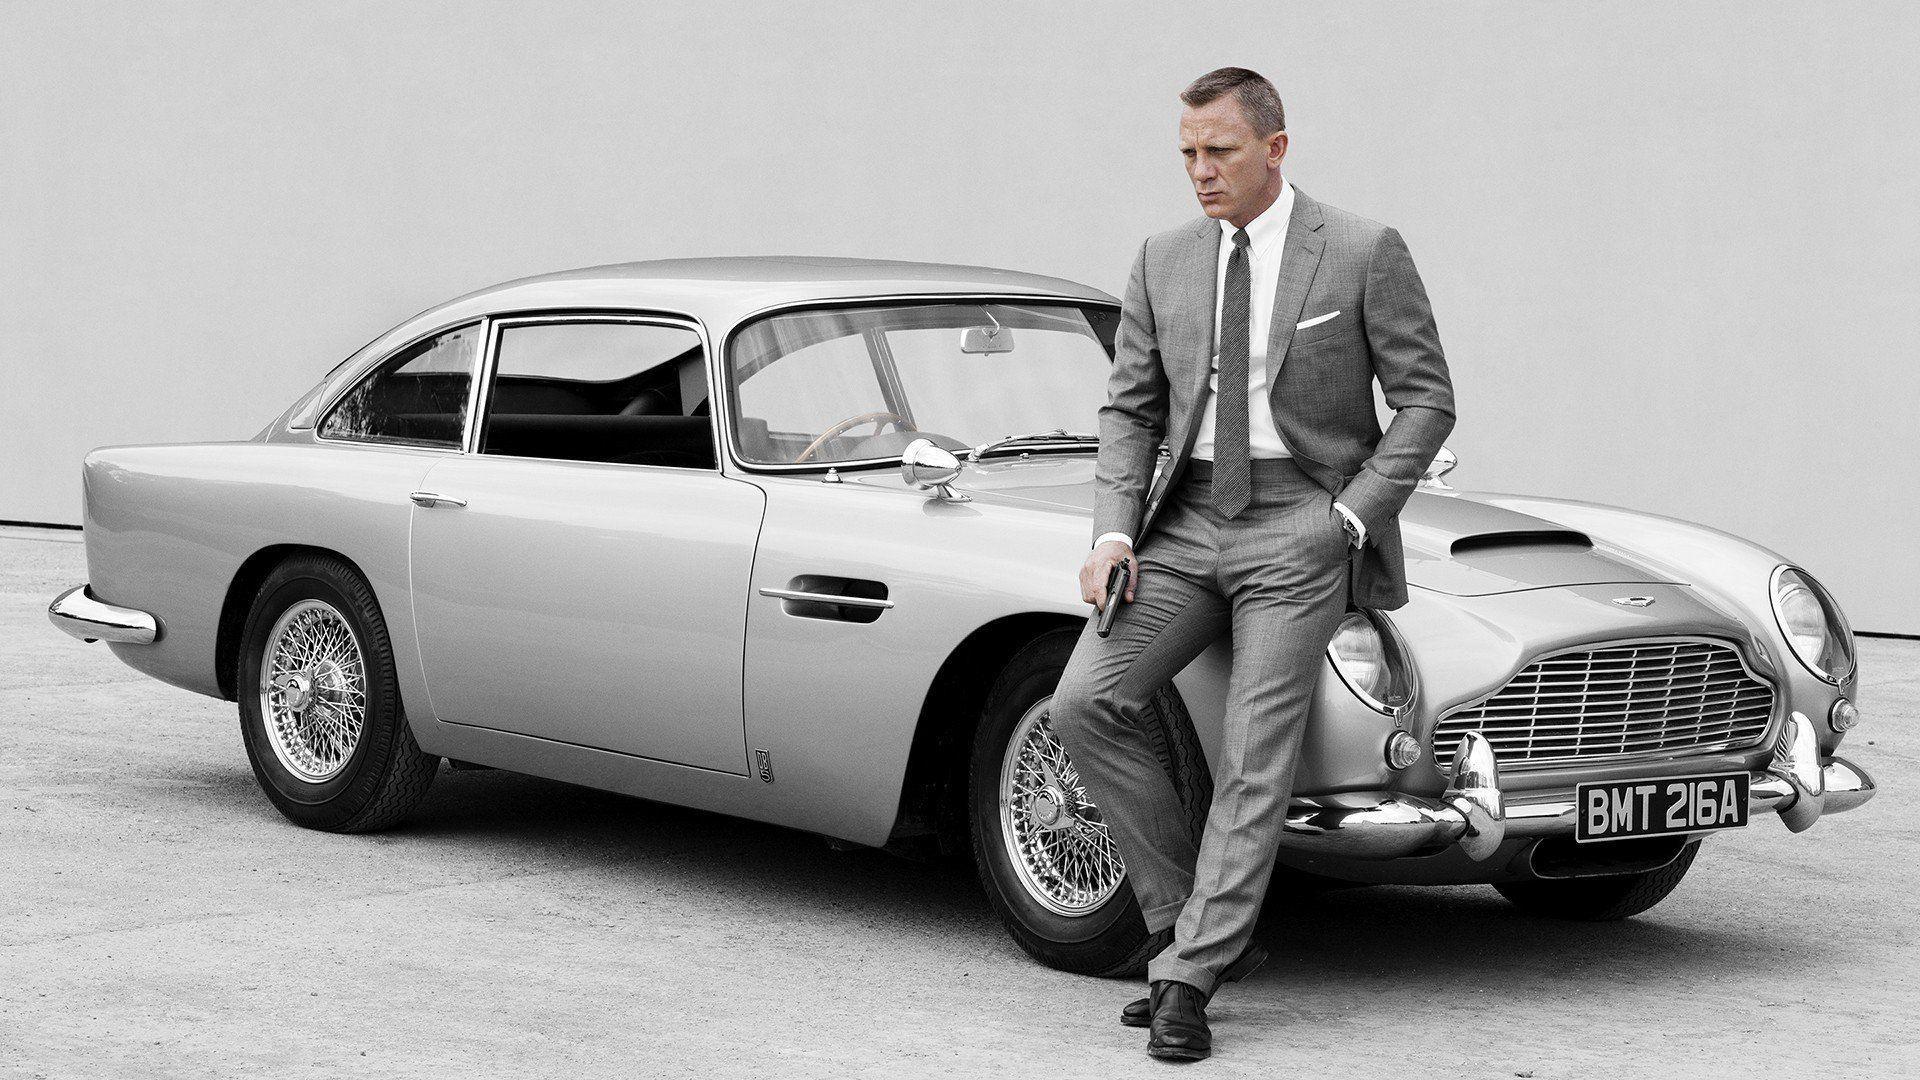 James Bond Aston Martin Wallpapers Top Free James Bond Aston Martin Backgrounds Wallpaperaccess